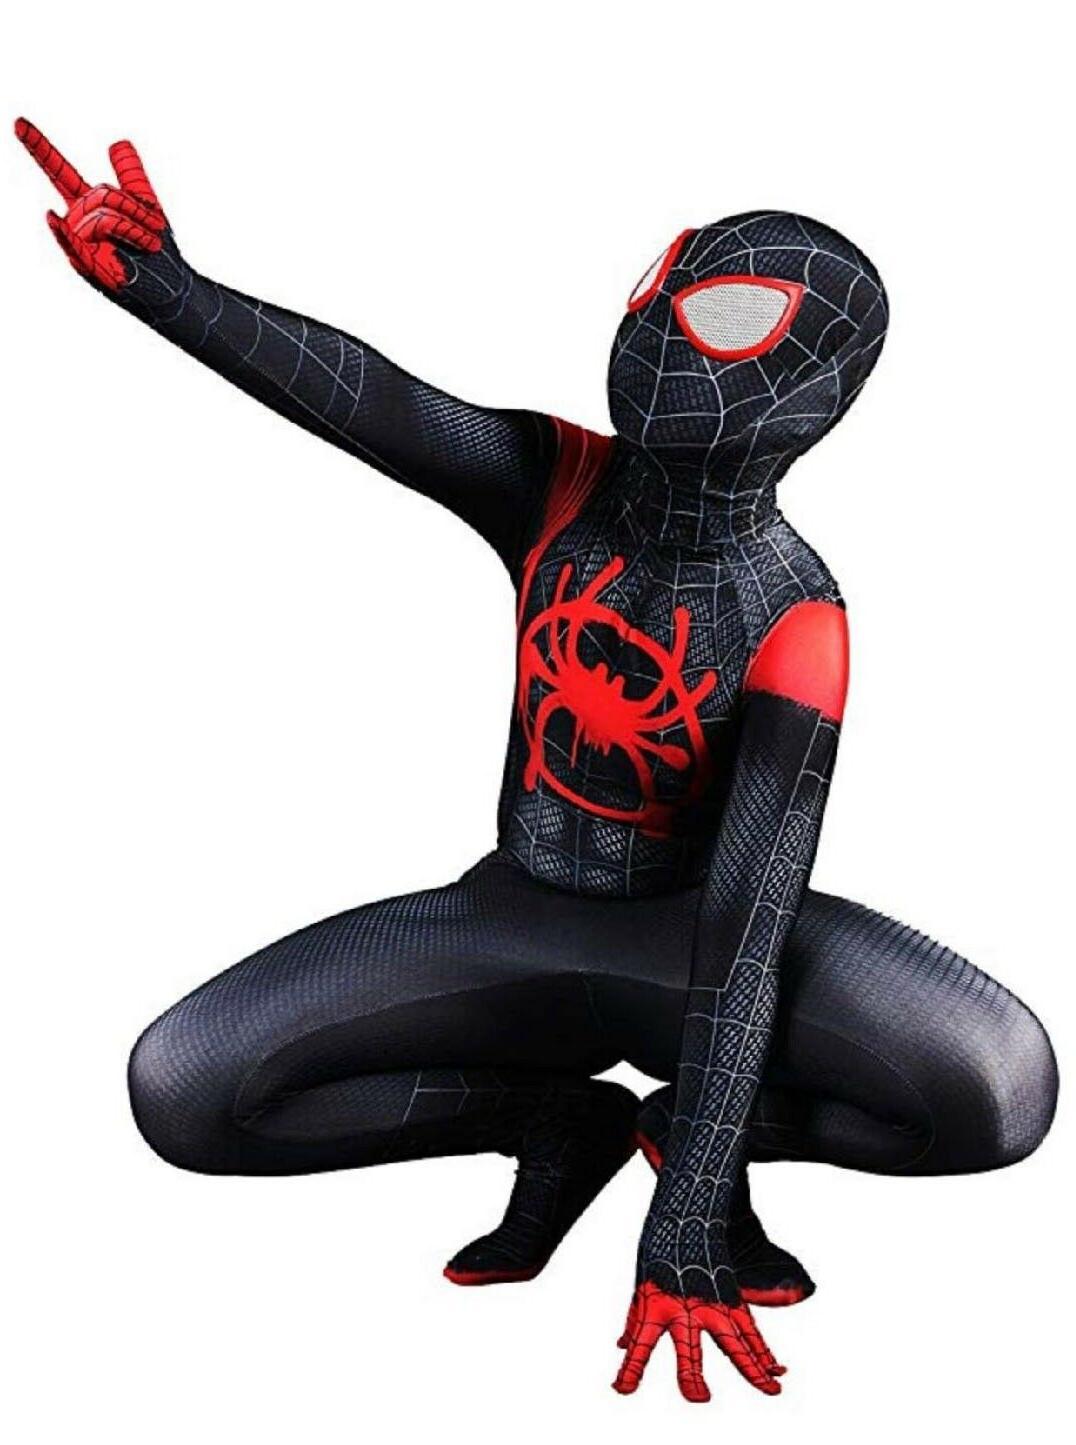 miles morales spider man costume jumpsuits bodysuits